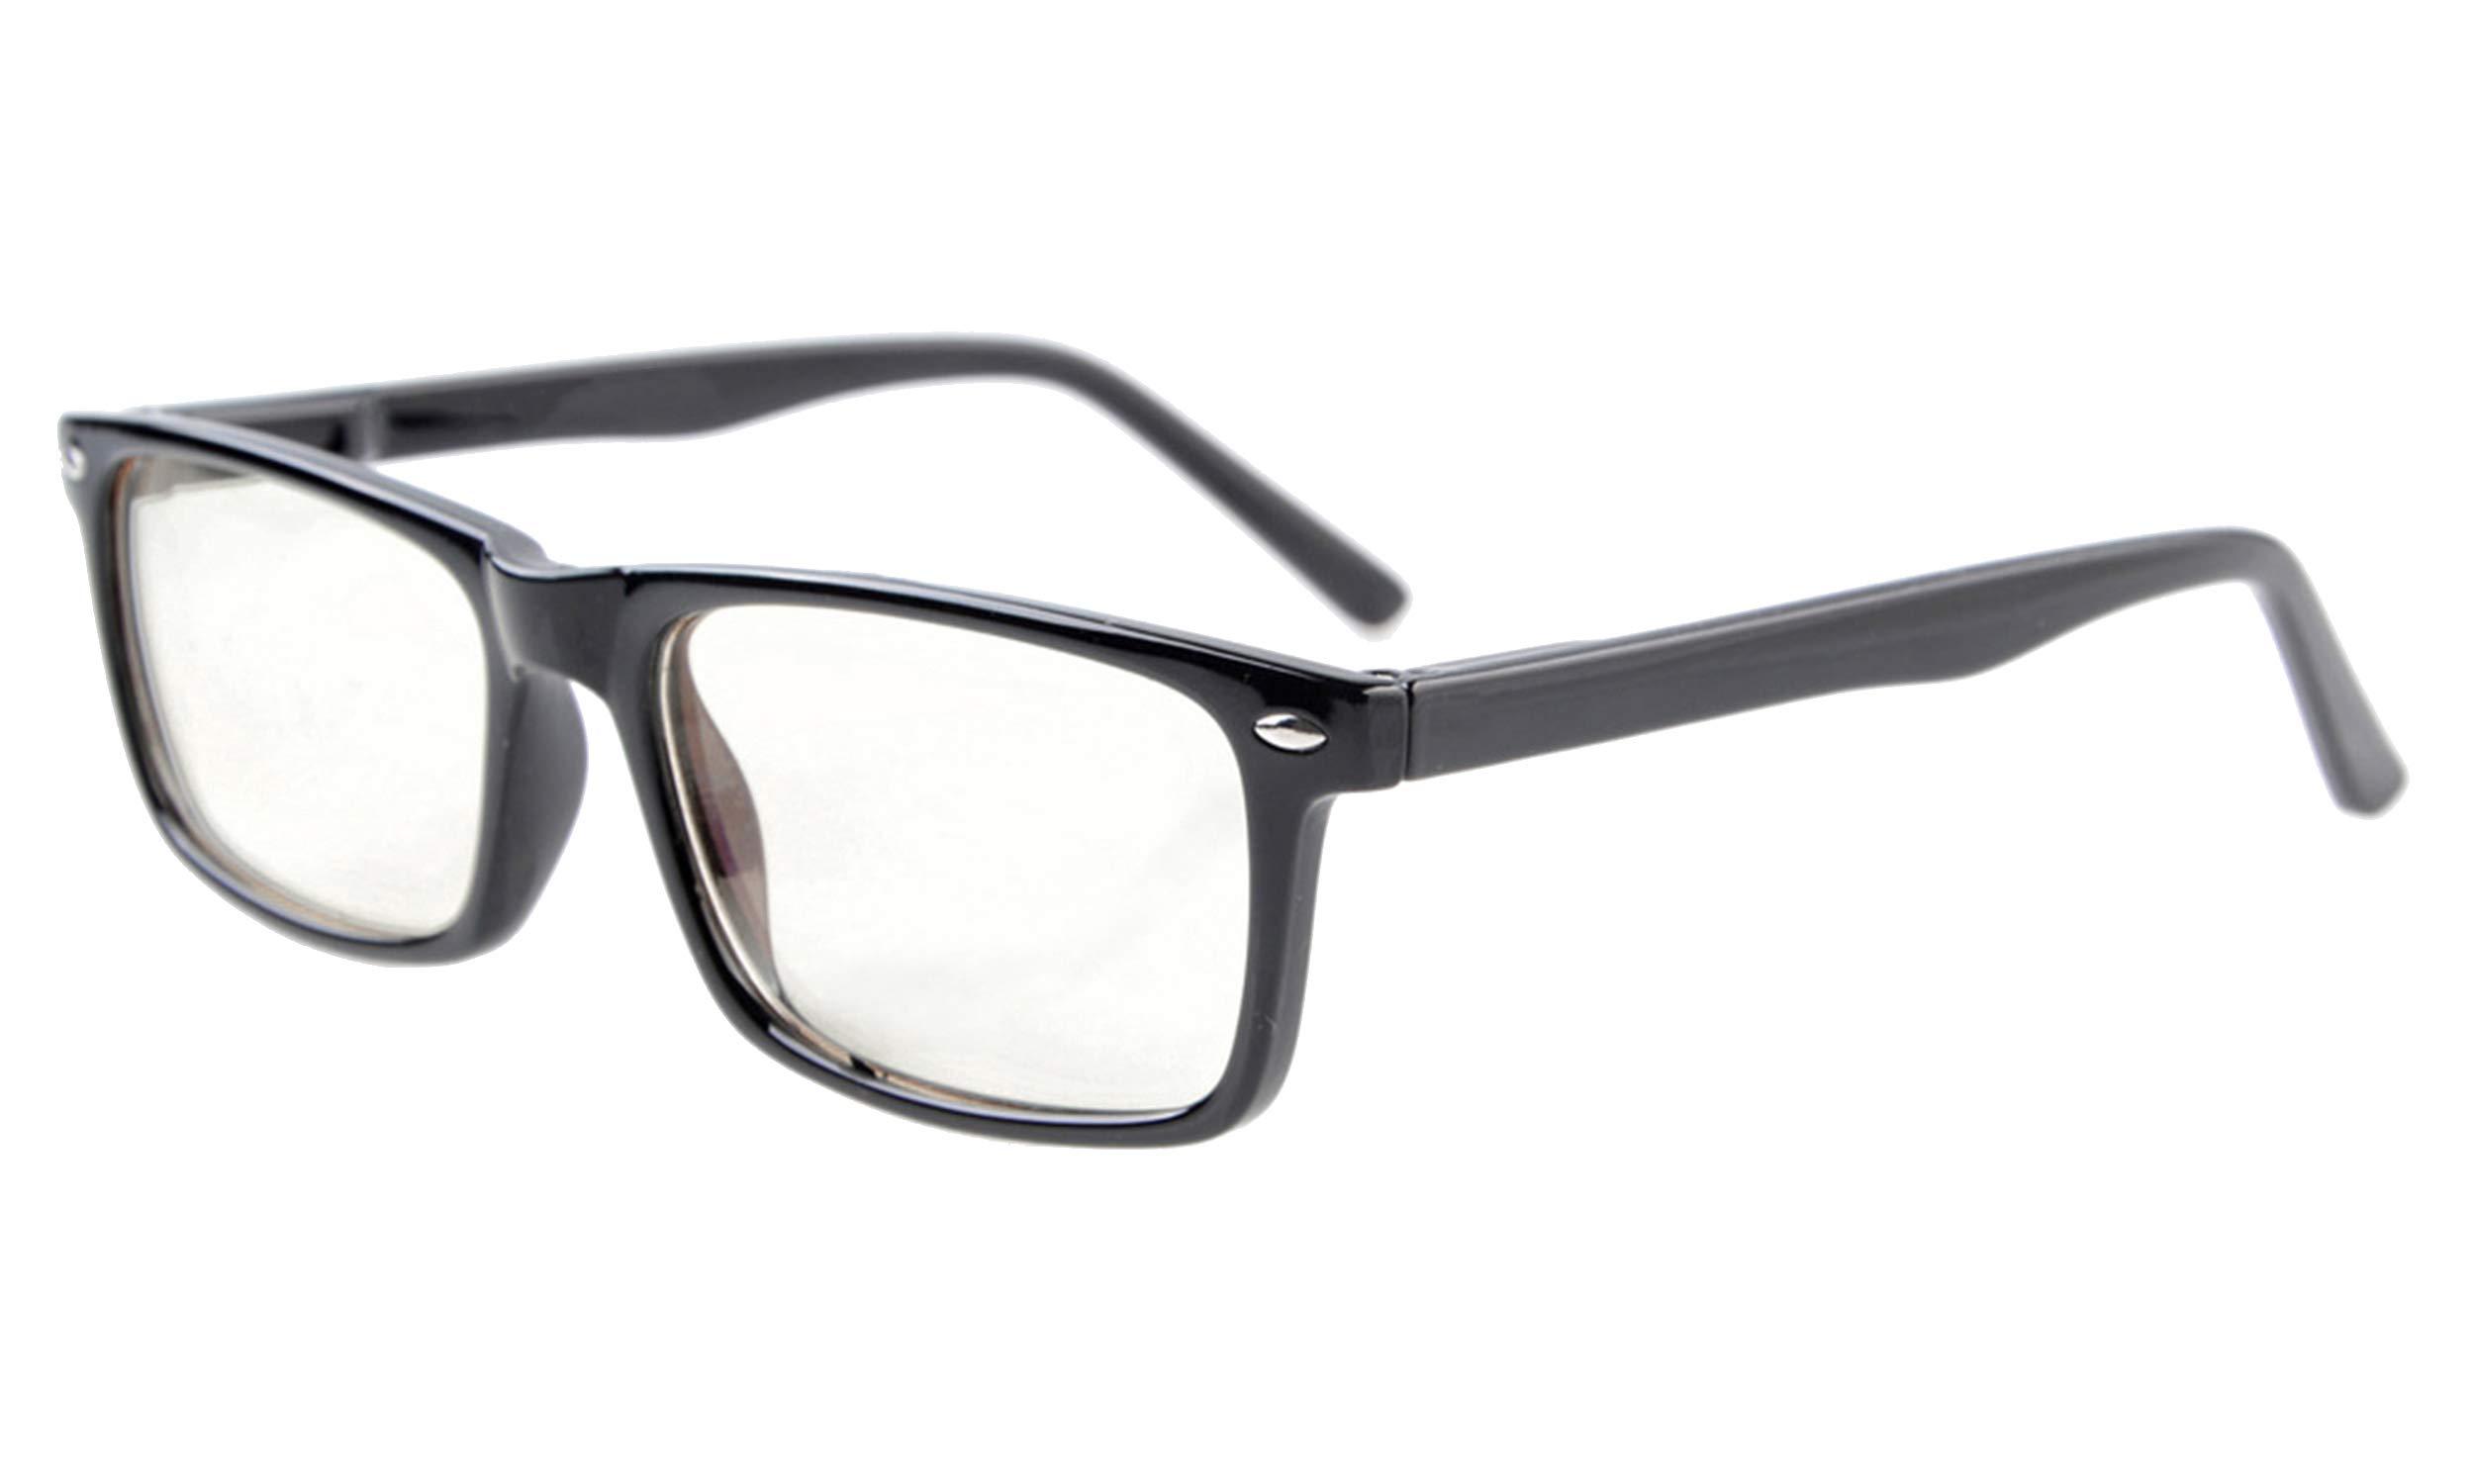 Eyekepper Readers UV Protection, Anti Glare Eyeglasses,Anti Blue Rays, Spring Hinges Computer Eyeglasses Black by Eyekepper